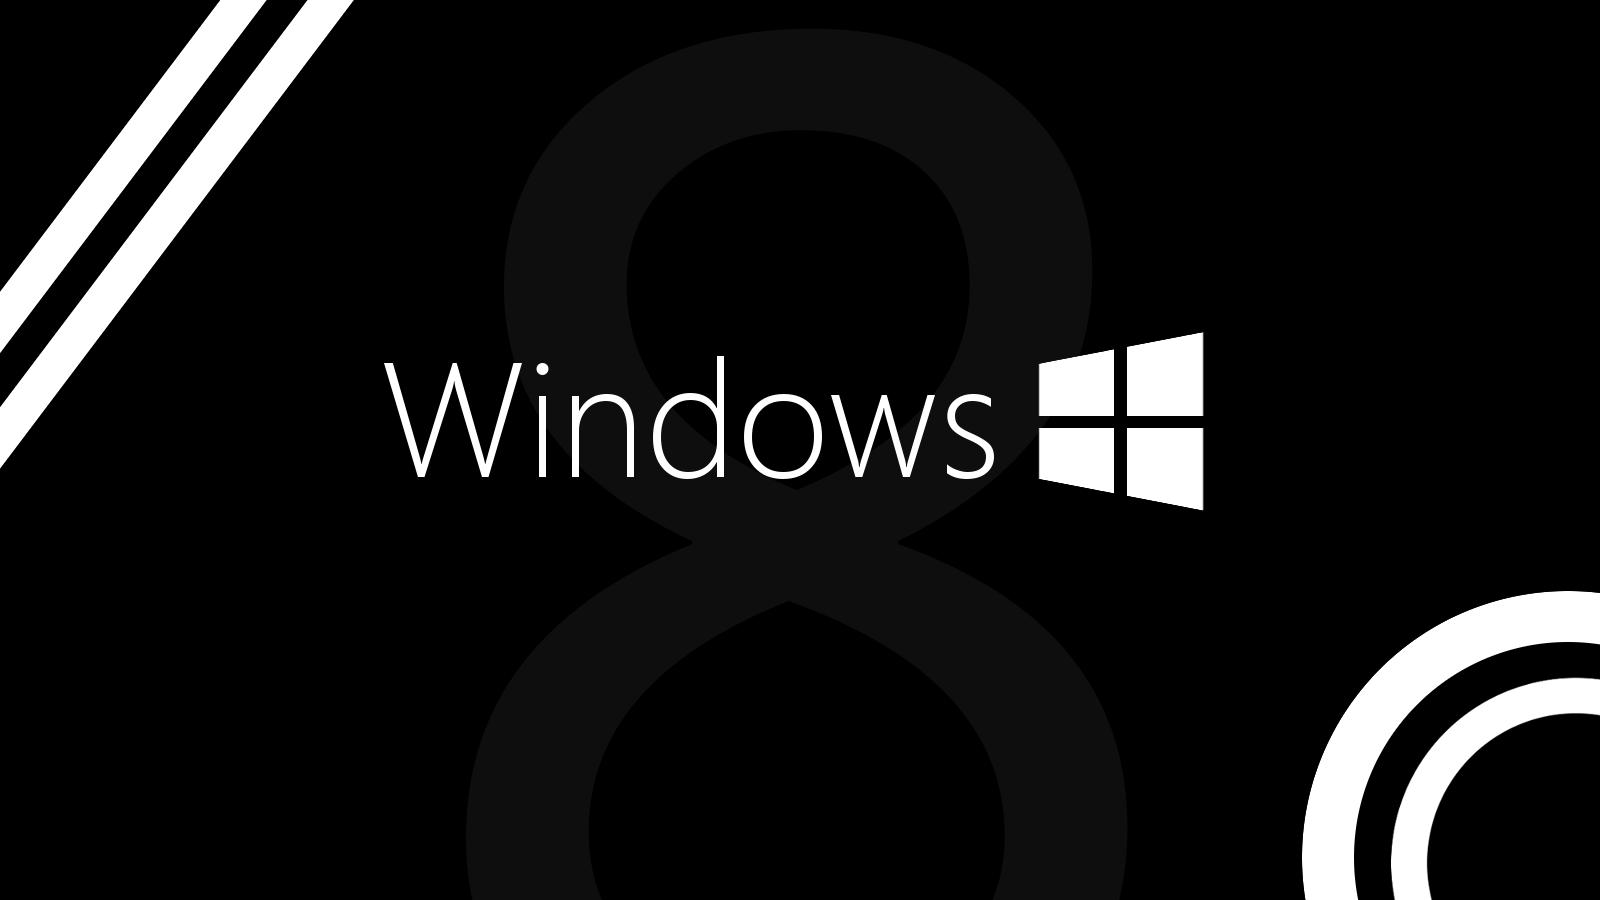 Black Windows - Wallpapers for windows 8 mobile wallpaper black